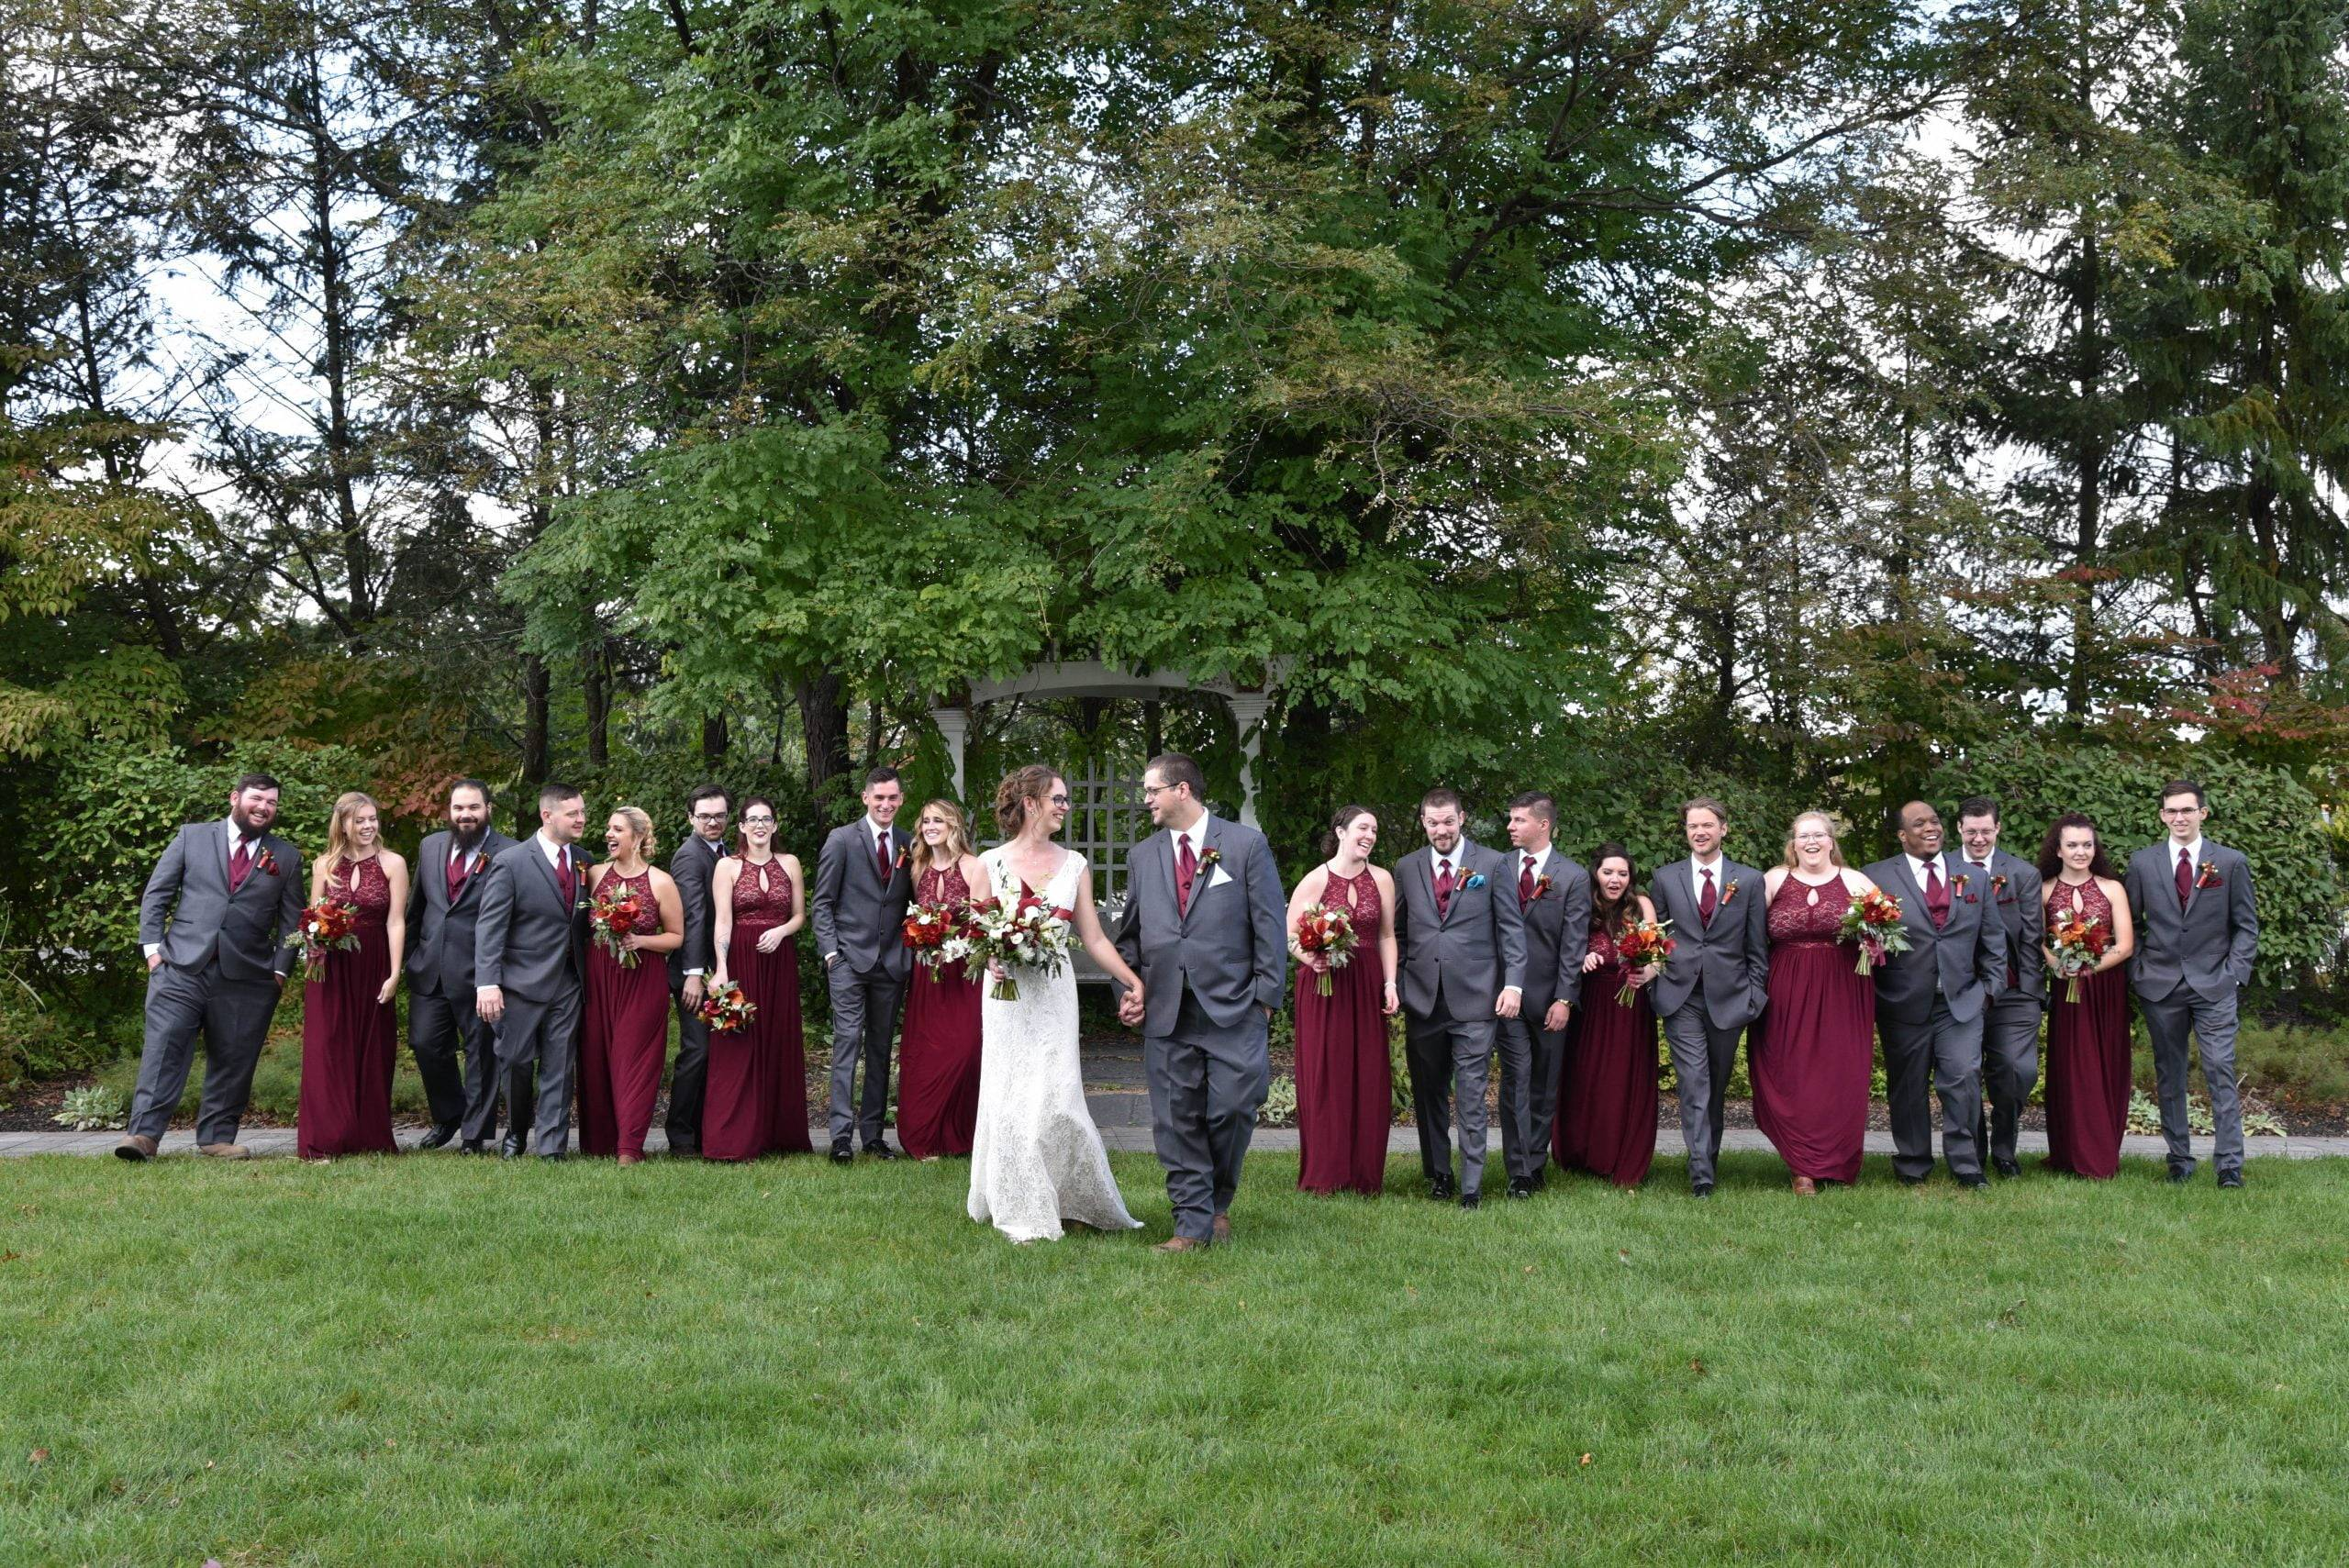 Birchwood Manor bridal party